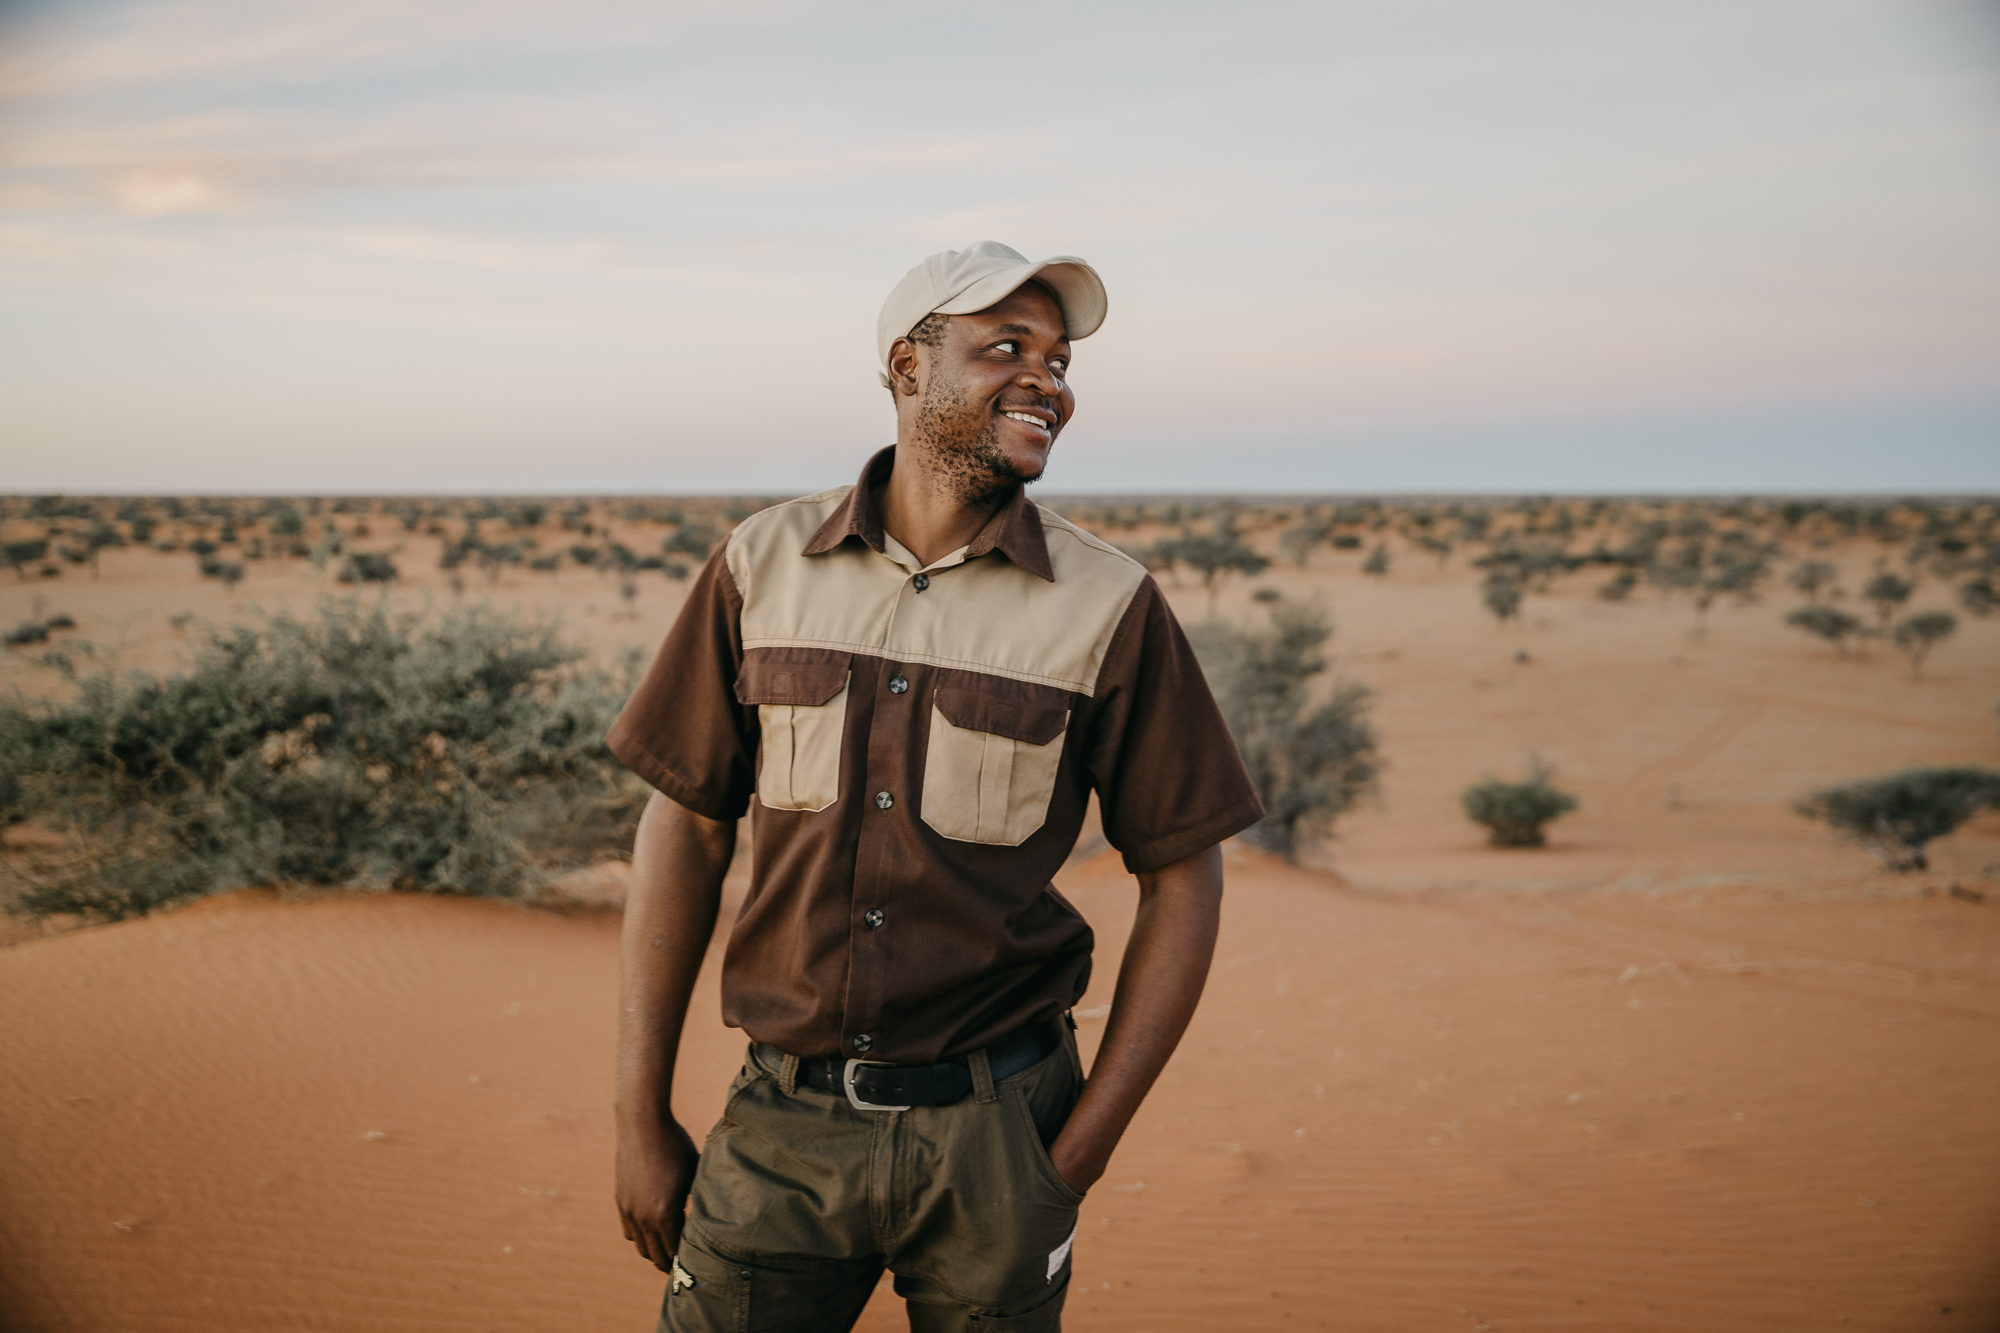 061518_Namibia_PIXd2camF_00234.jpg